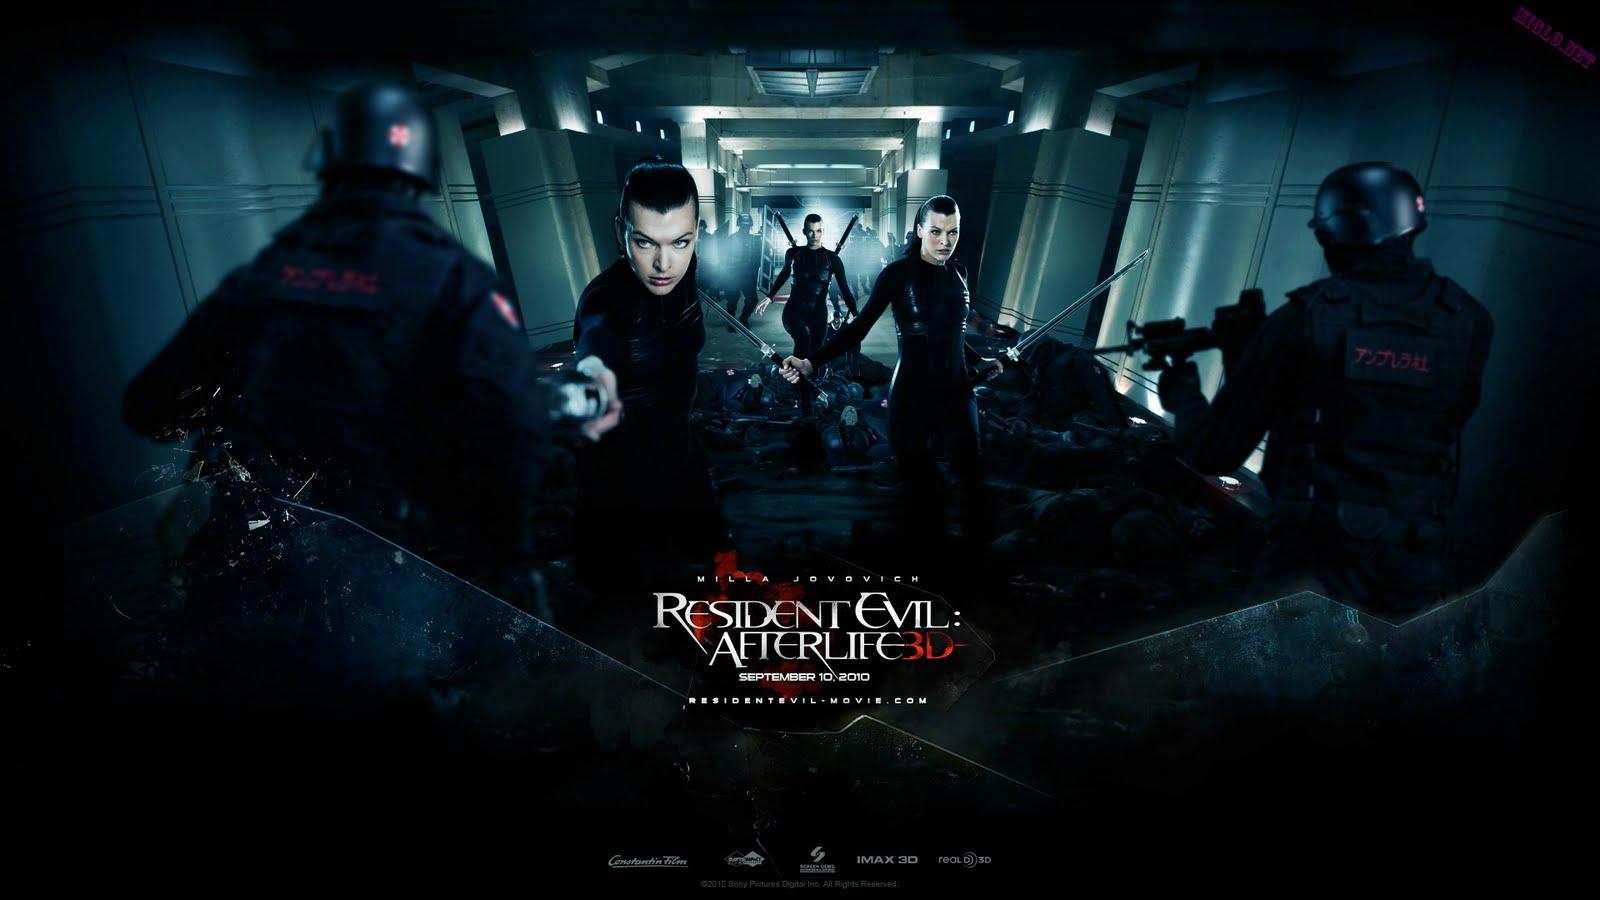 http://1.bp.blogspot.com/_V6TVDECge74/TFAIkByuT_I/AAAAAAAAAvc/_rOaFdeQShM/s1600/Milla_Jovovich_in_Resident_Evil-_Afterlife_Wallpaper+widescreen.jpg